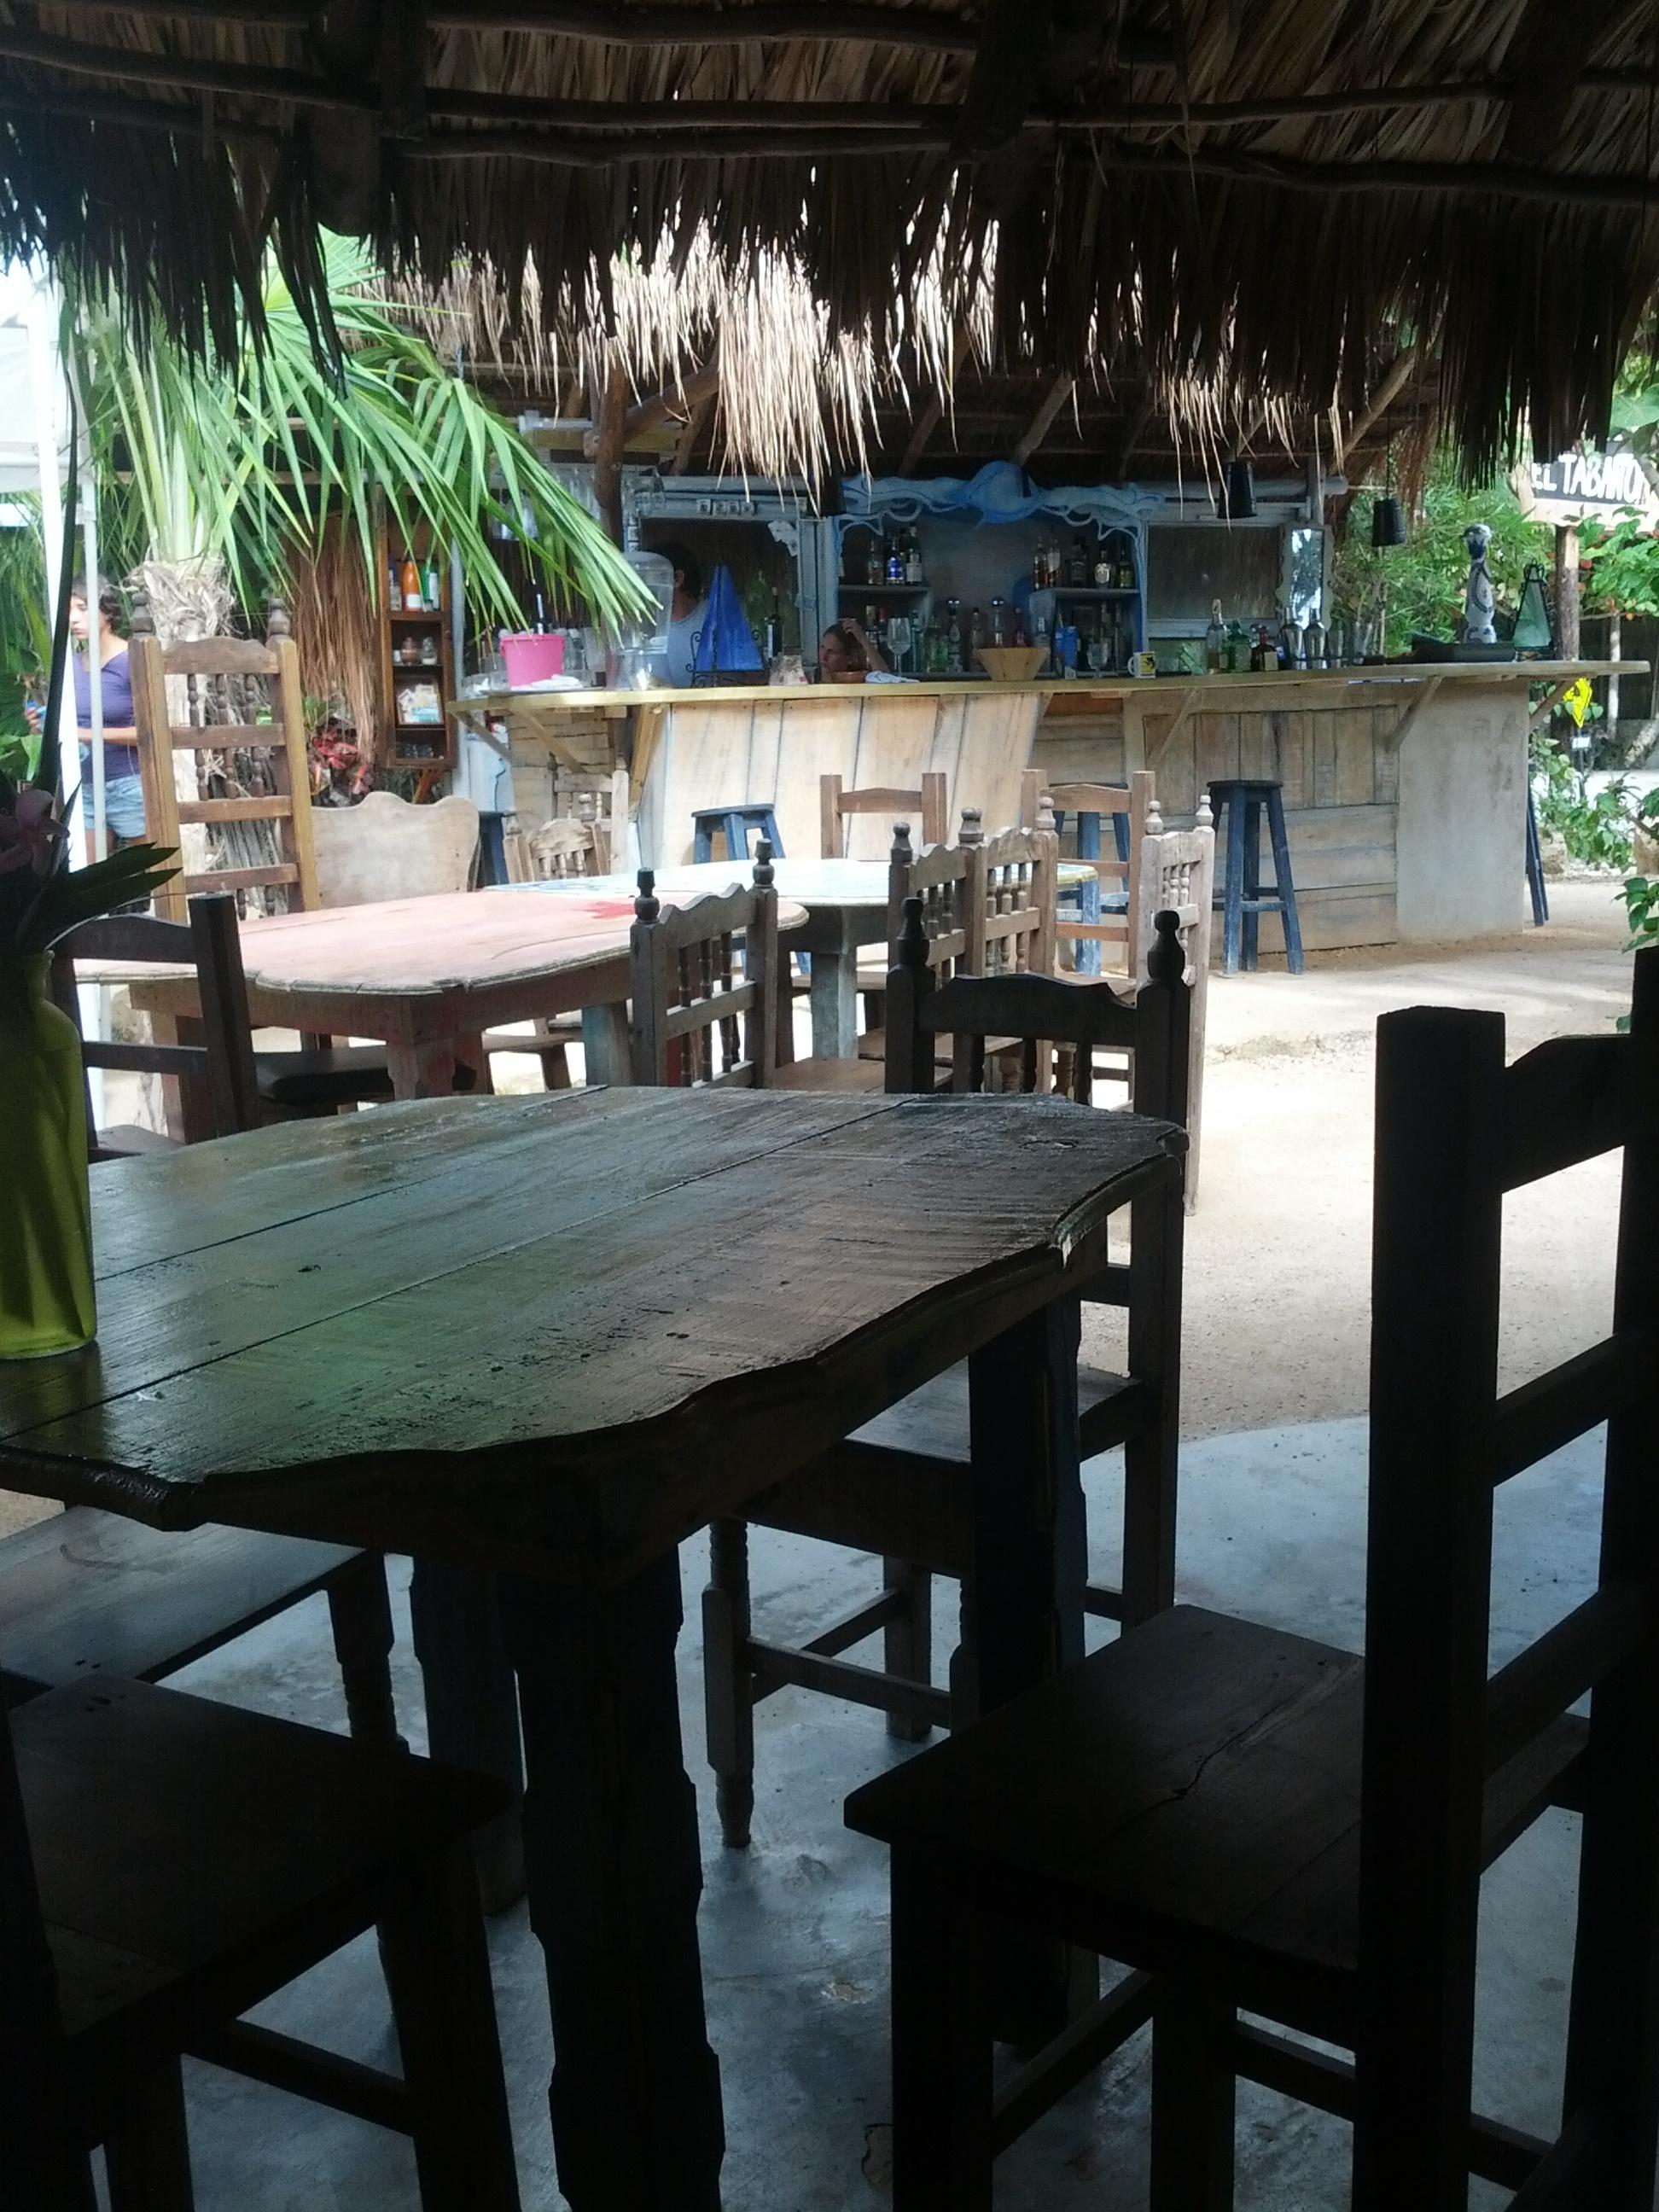 Laid back El Tábano restaurante at the Tulum beach strip